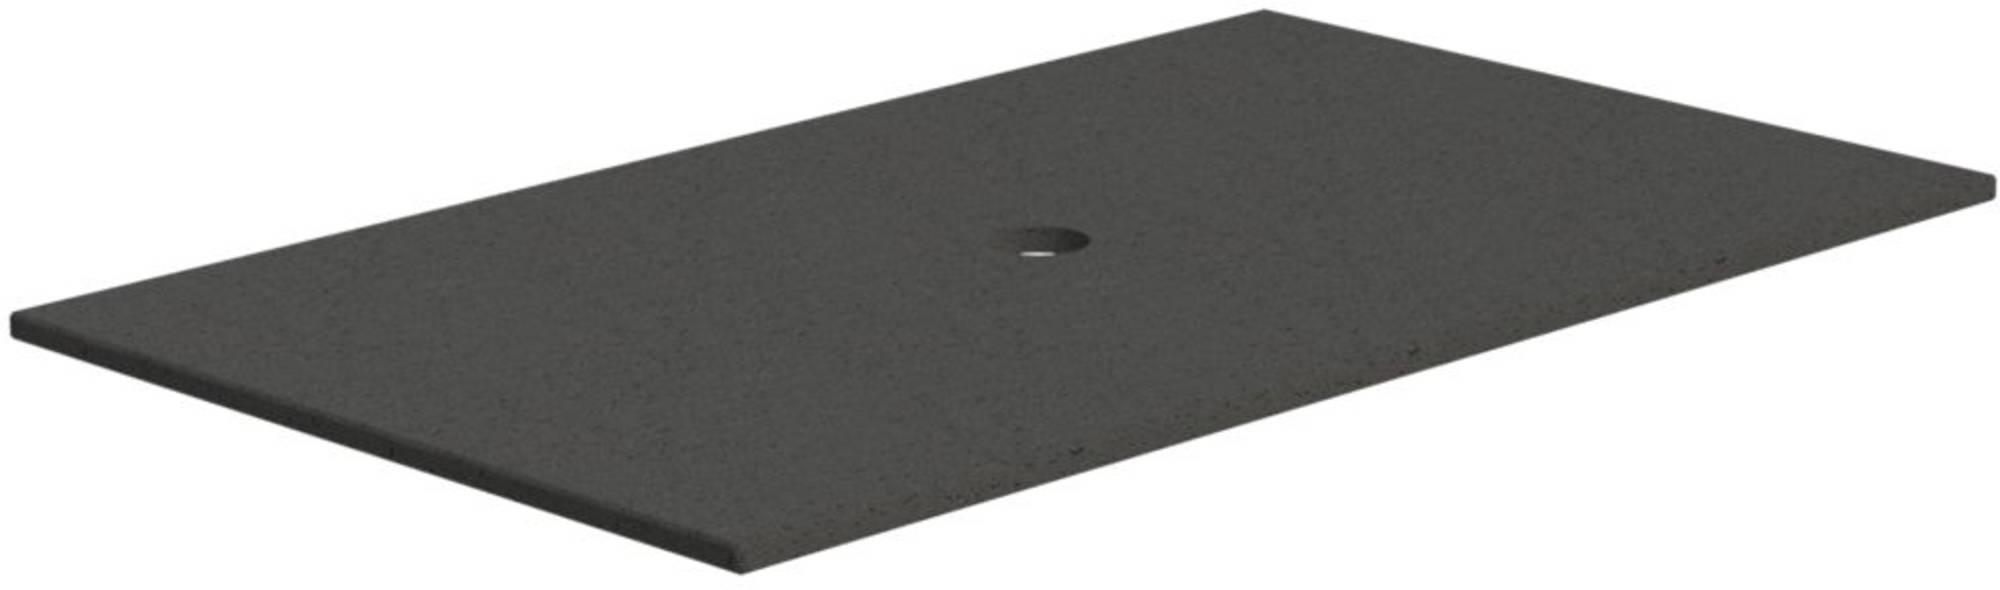 Thebalux Stone 1 Afdekblad Composiet 82x48,5x1,3 cm Bluestone gezoet